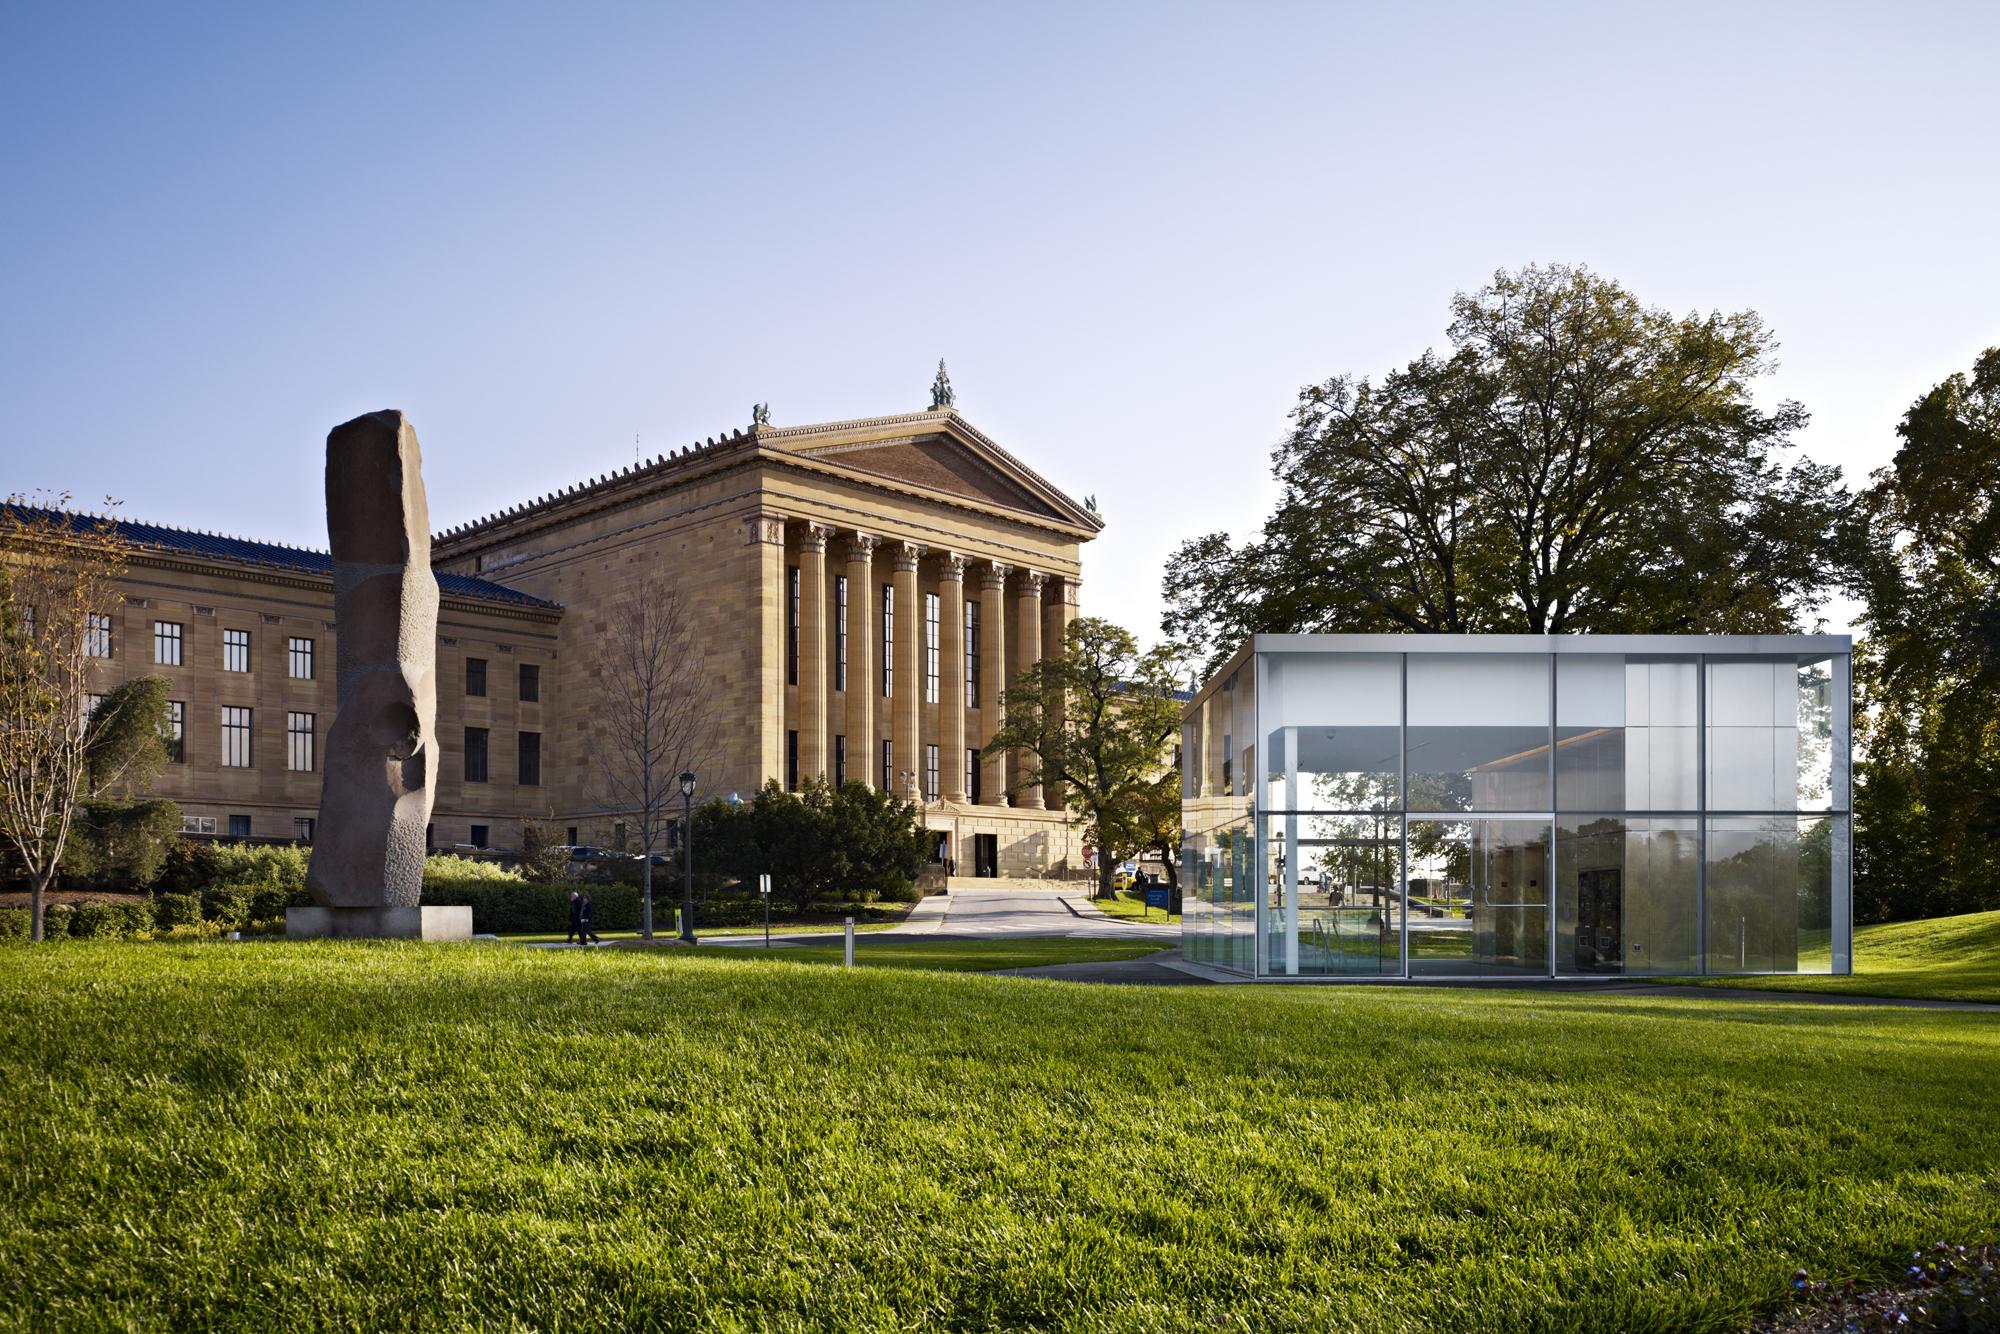 Philadelphia Museum Of Art Anne Harnoncourt Sculpture Garden & Parking Facility Atkin Olshin